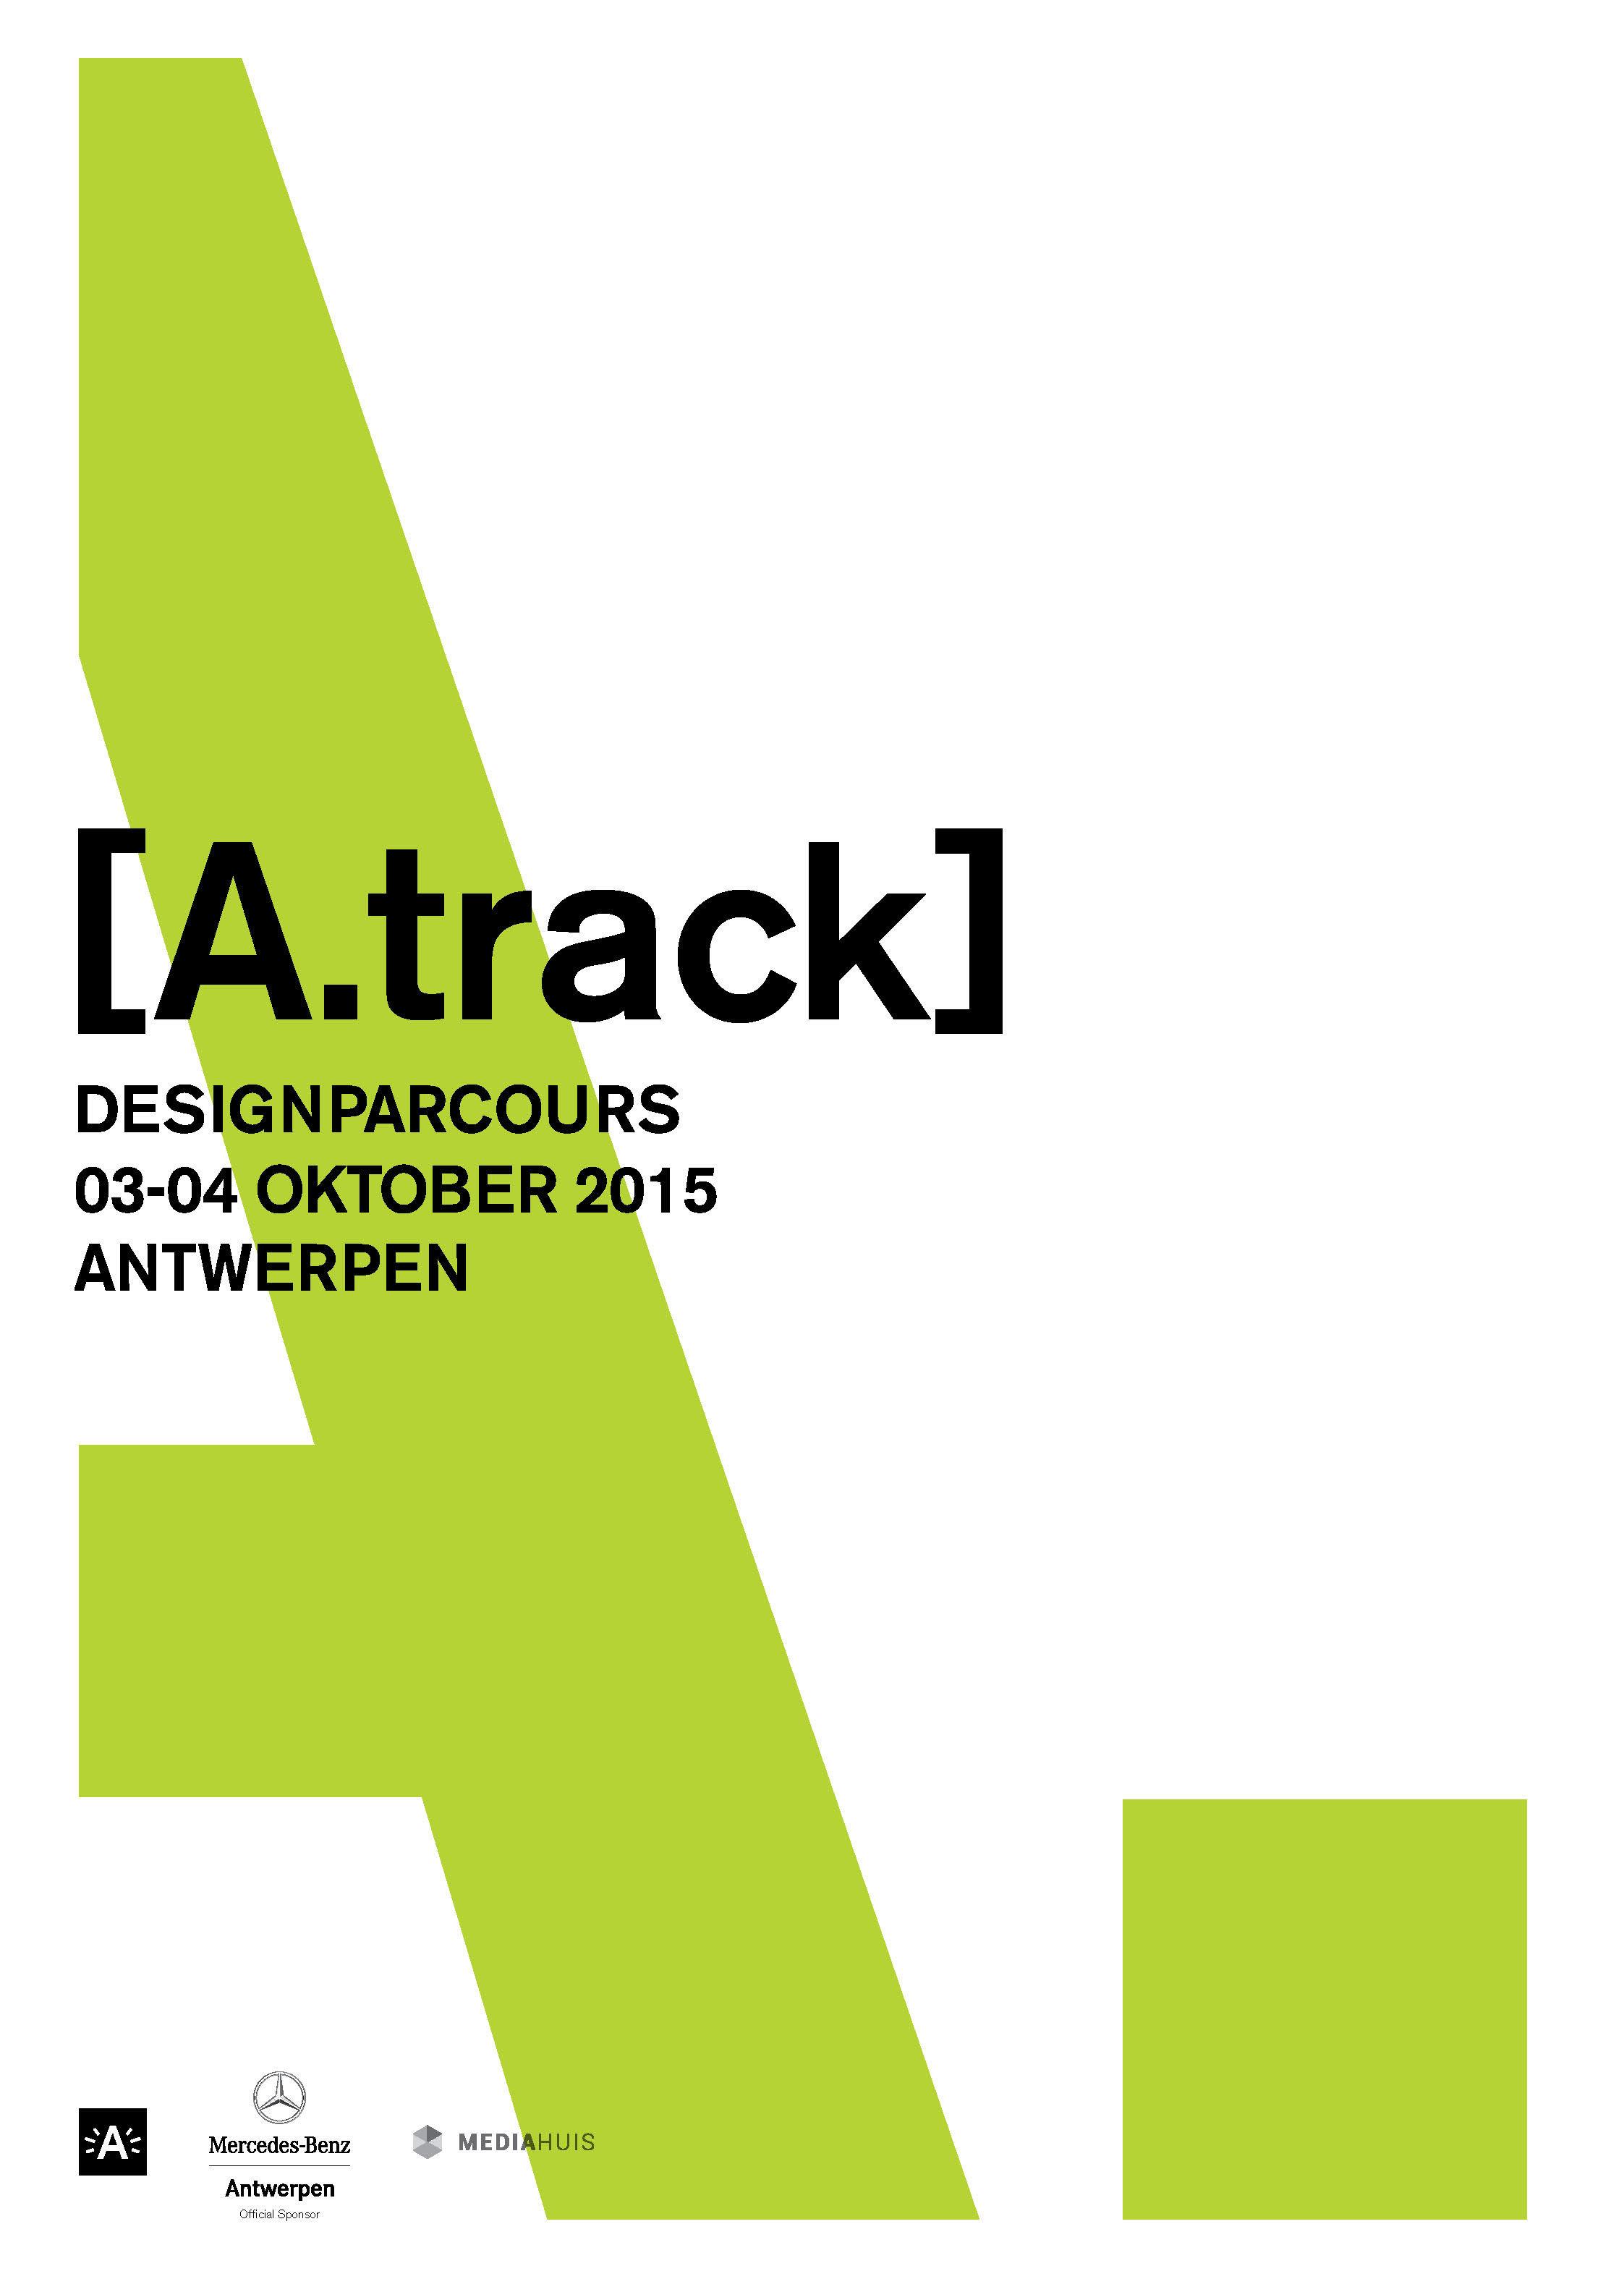 A Track En